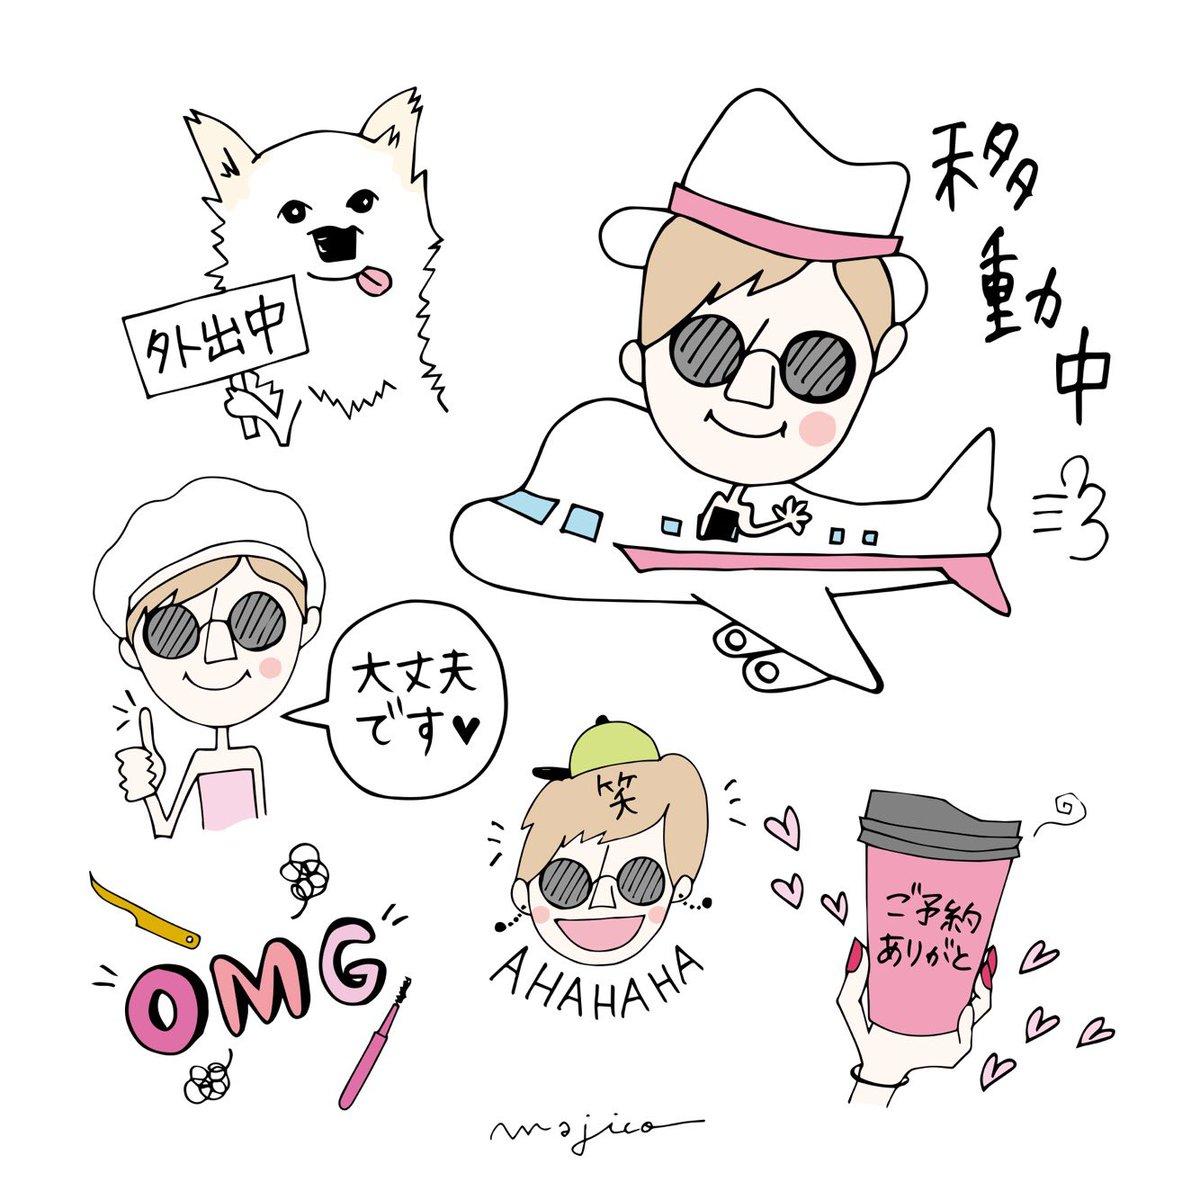 Majico On Twitter 三浦磨希 アイスタイリストマツエク マツエク